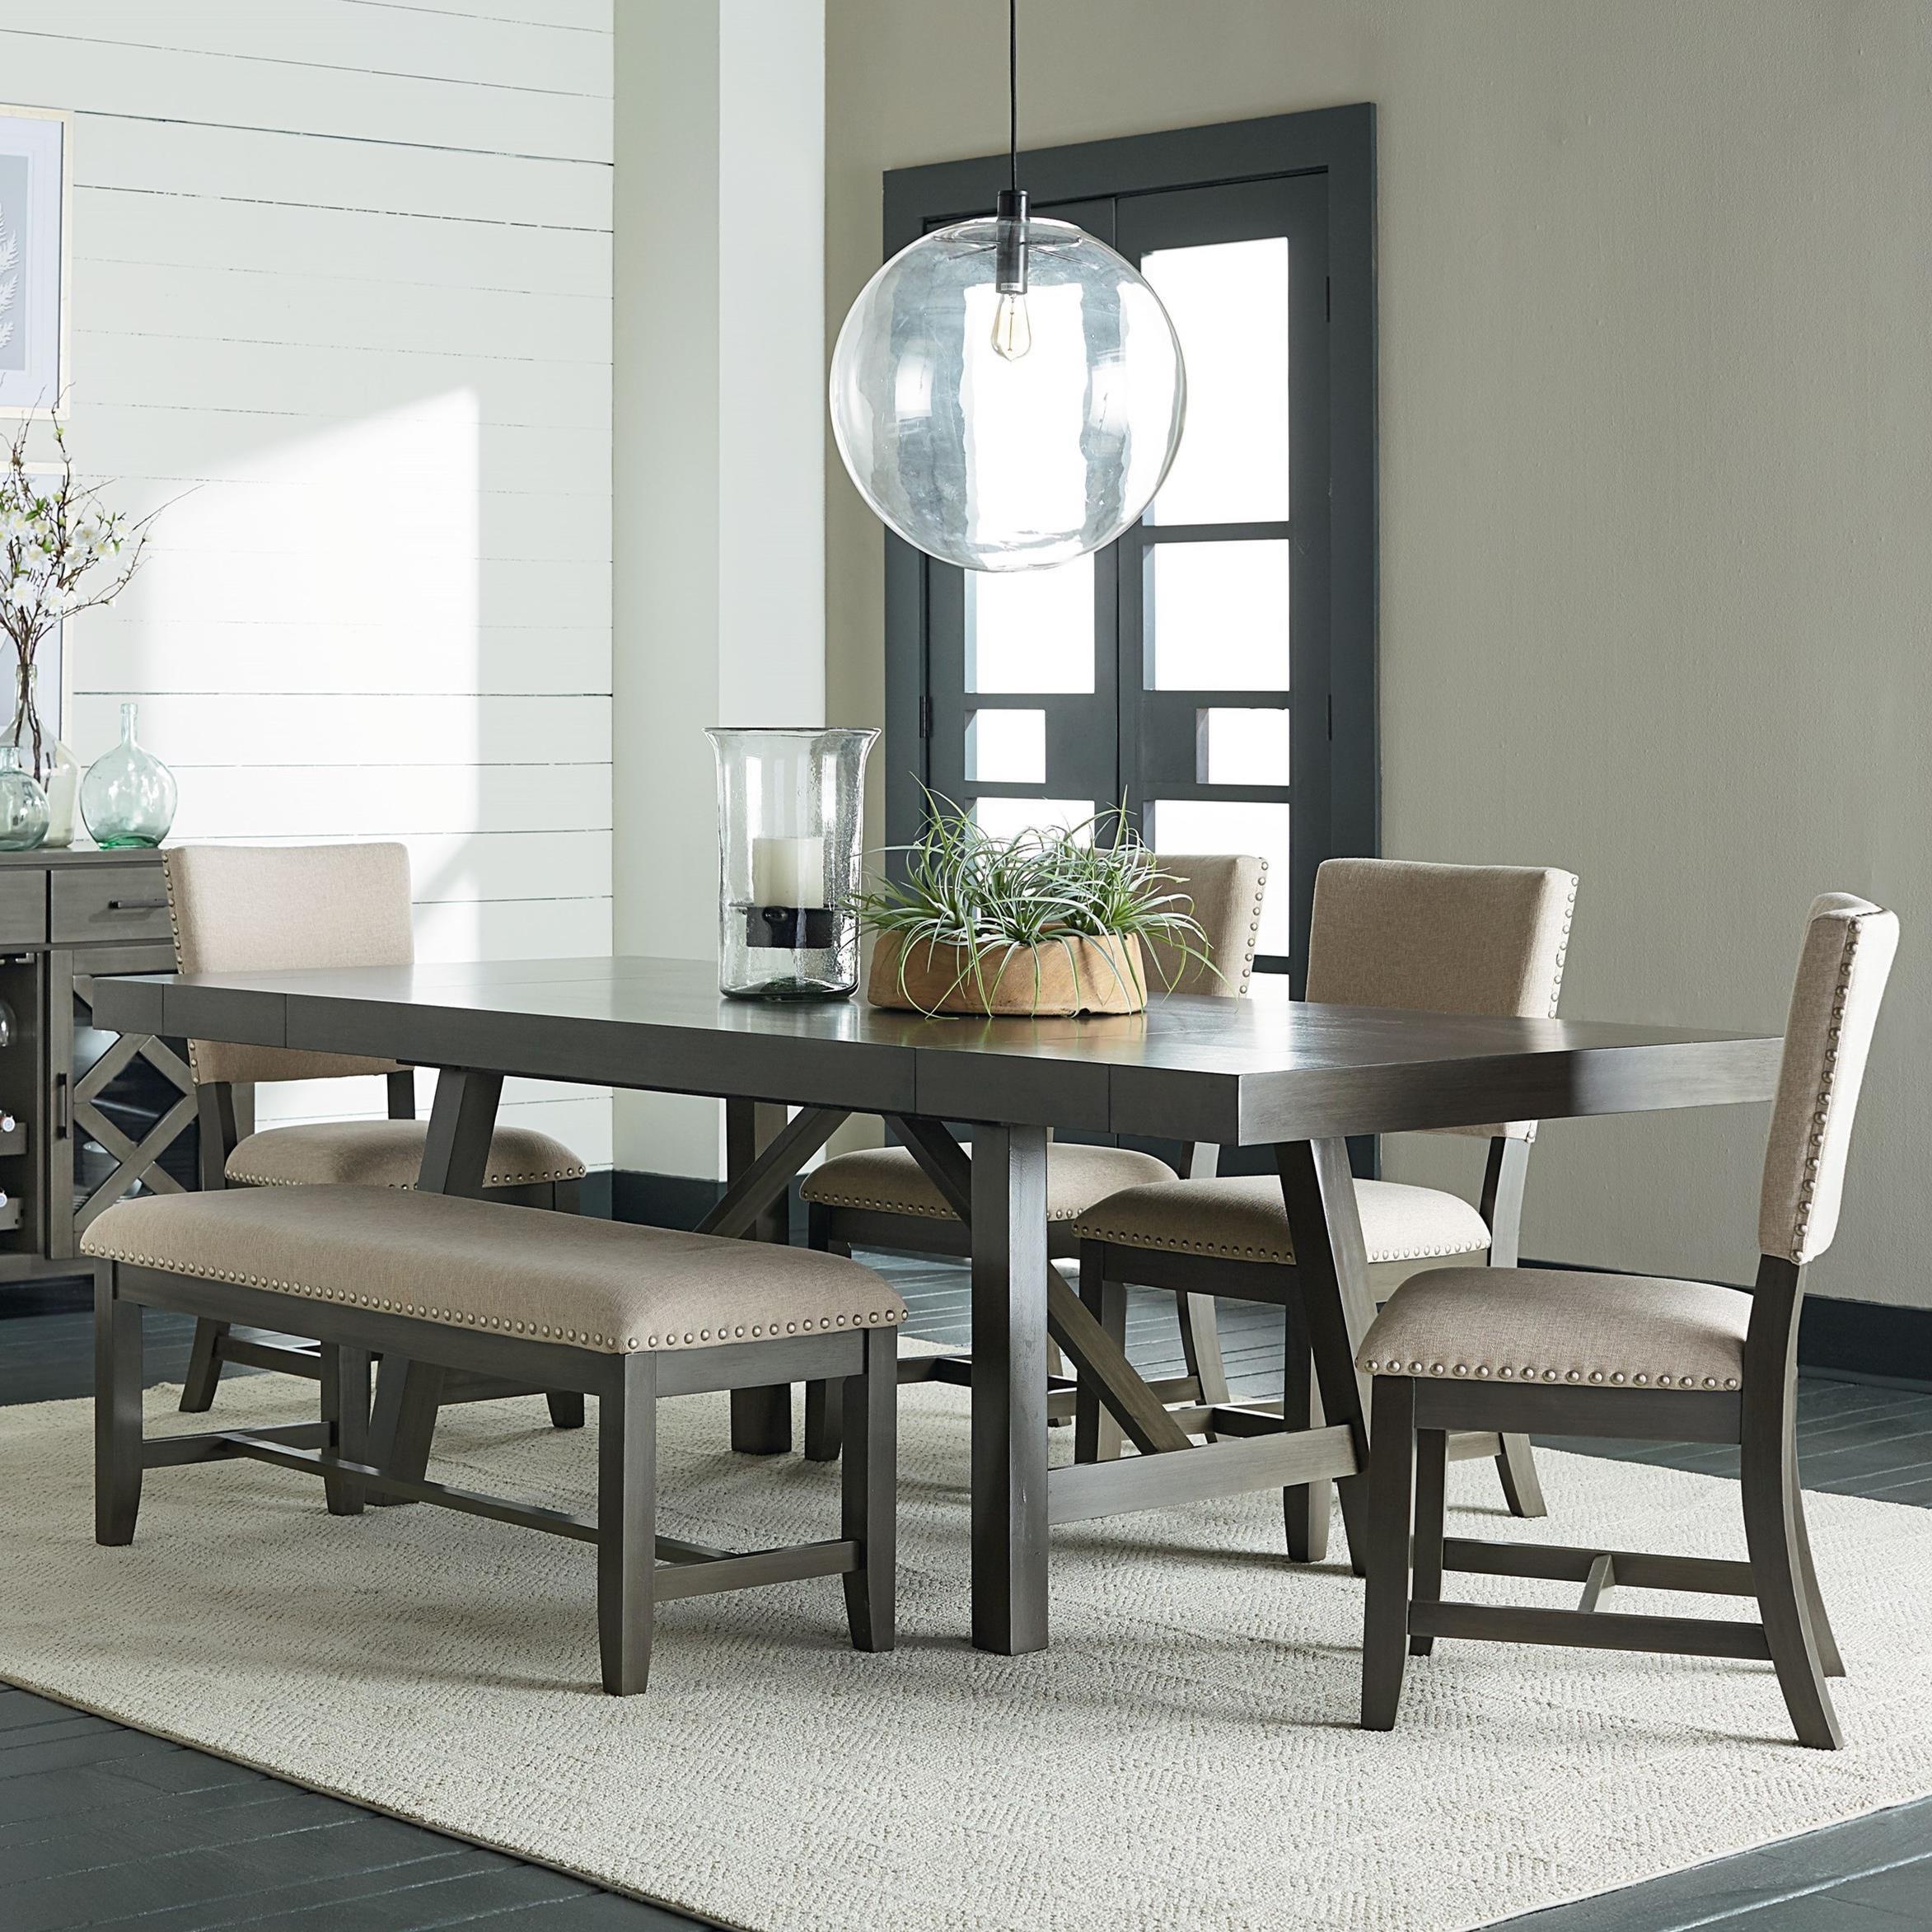 Standard Furniture Omaha Grey Trestle Table Dining Set - Item Number: 16681+88+4x87